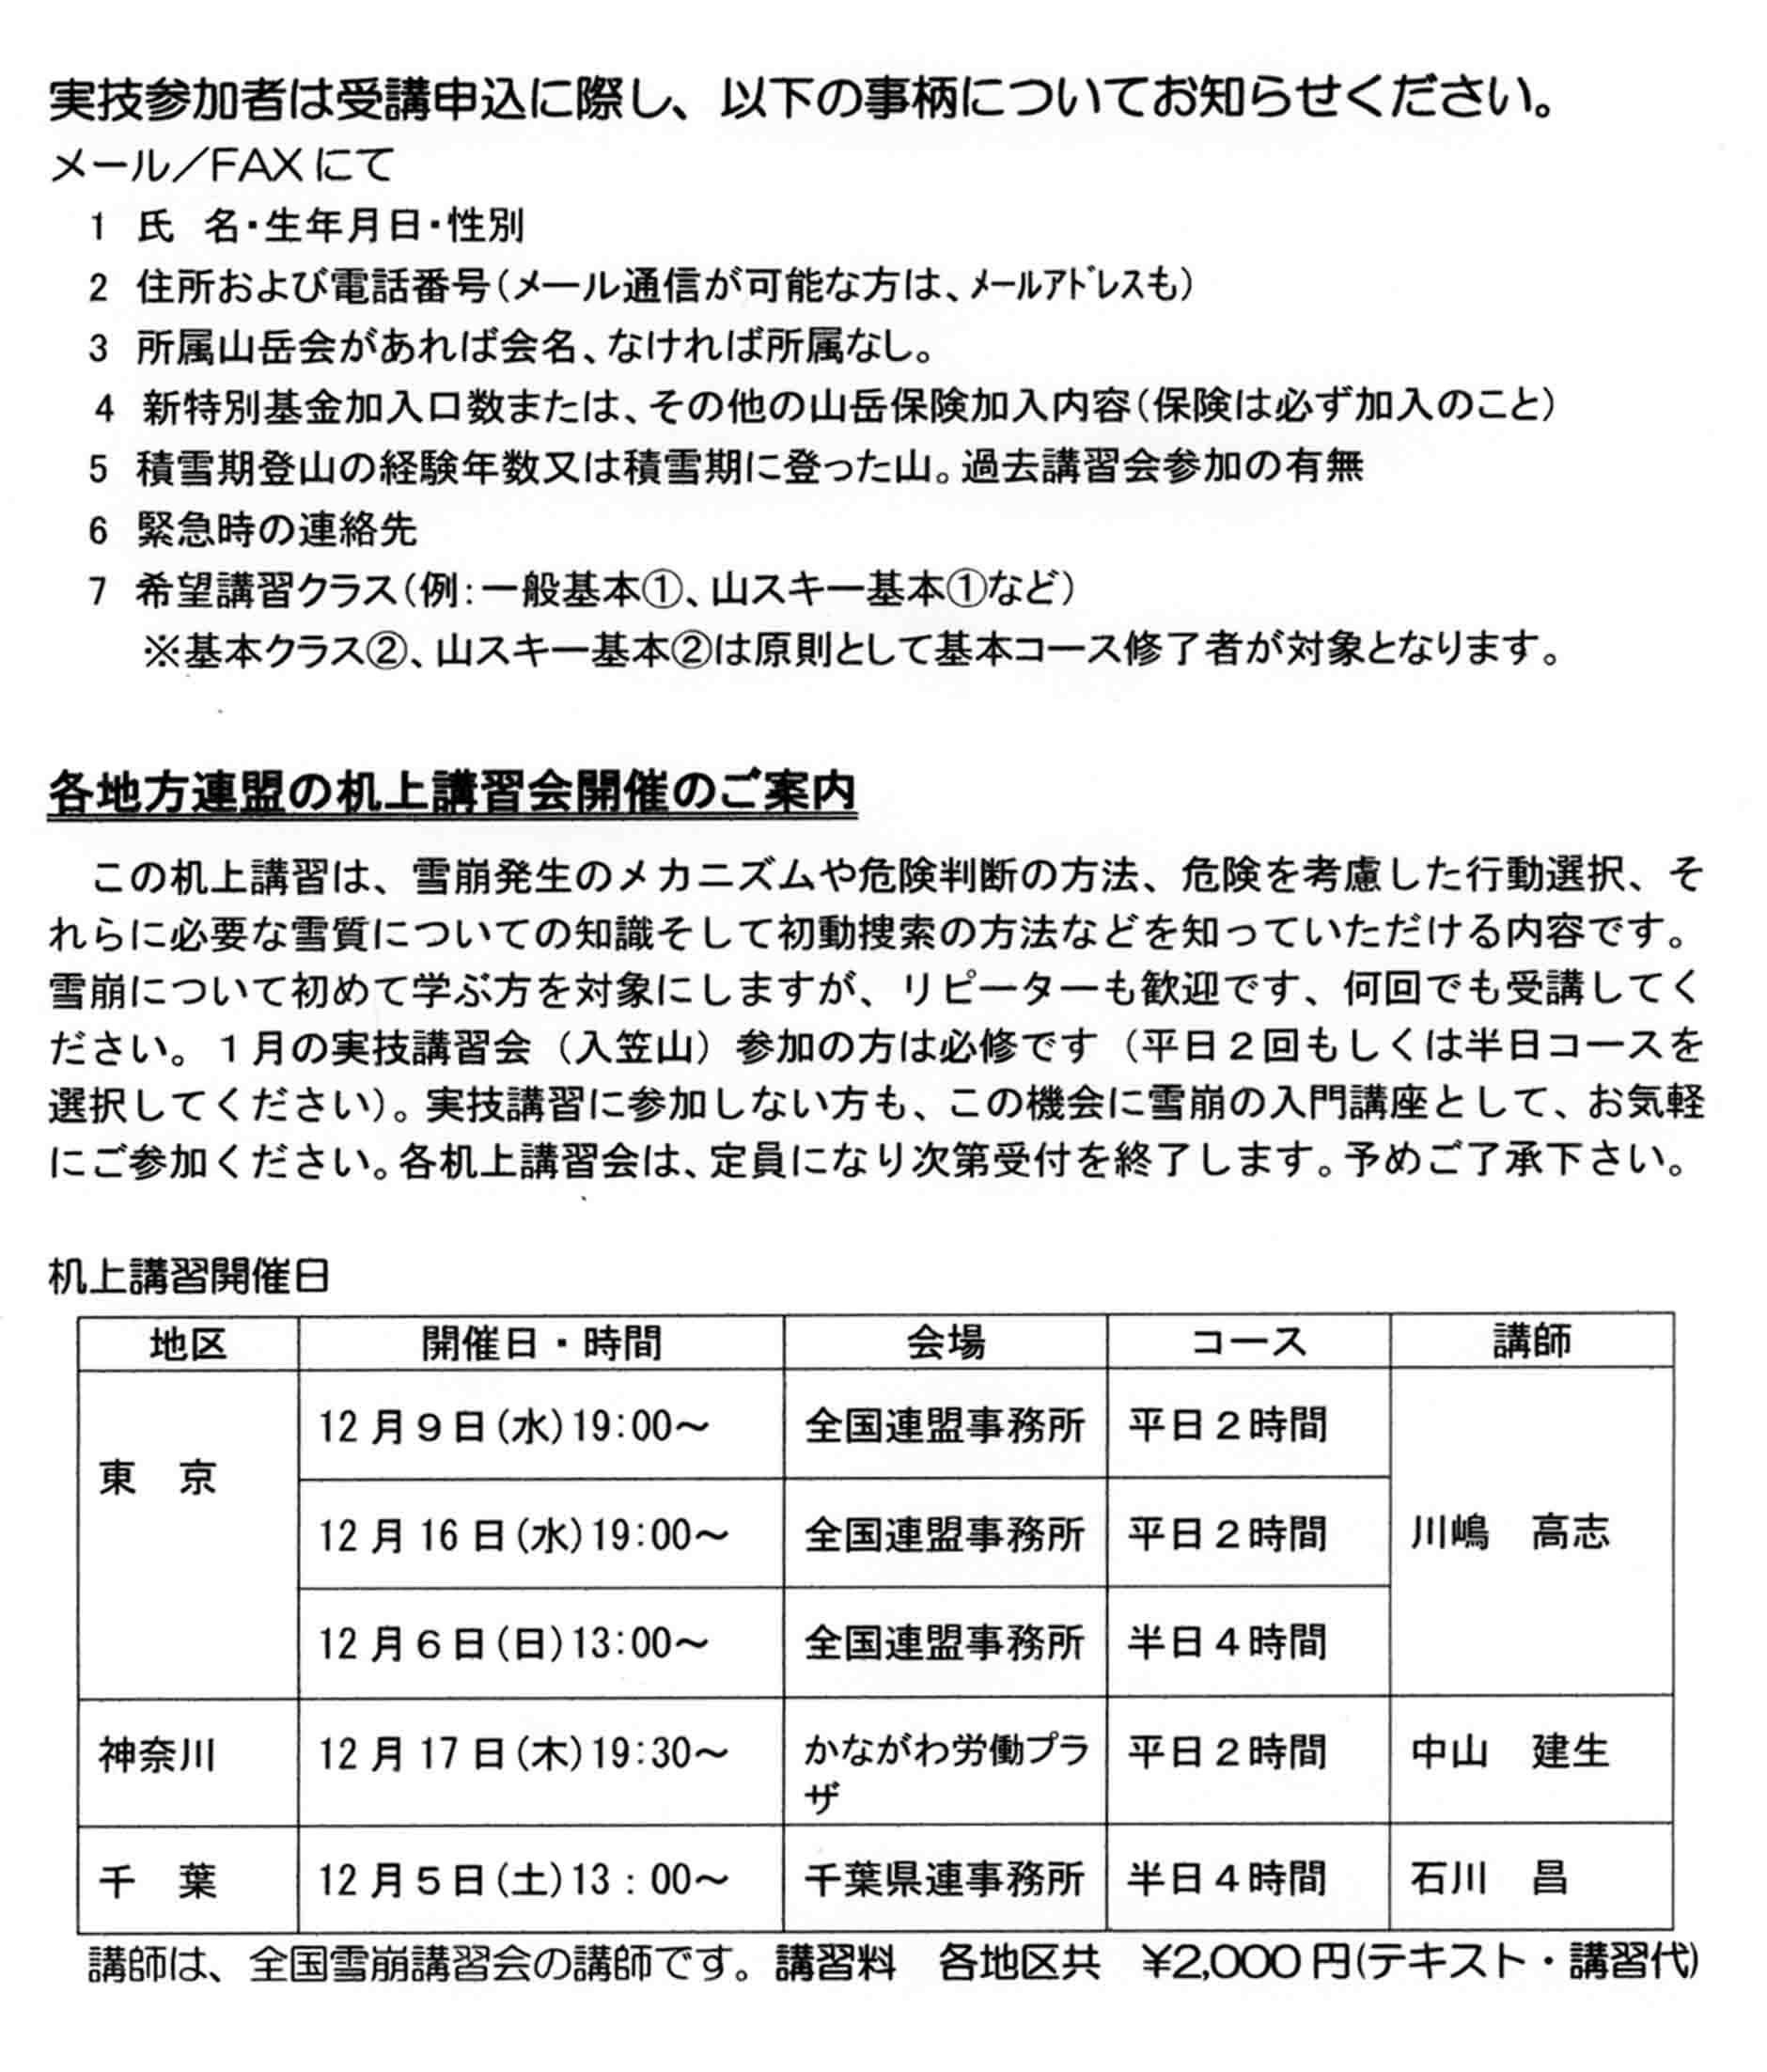 第17回関東ブロック雪崩講習会案内②